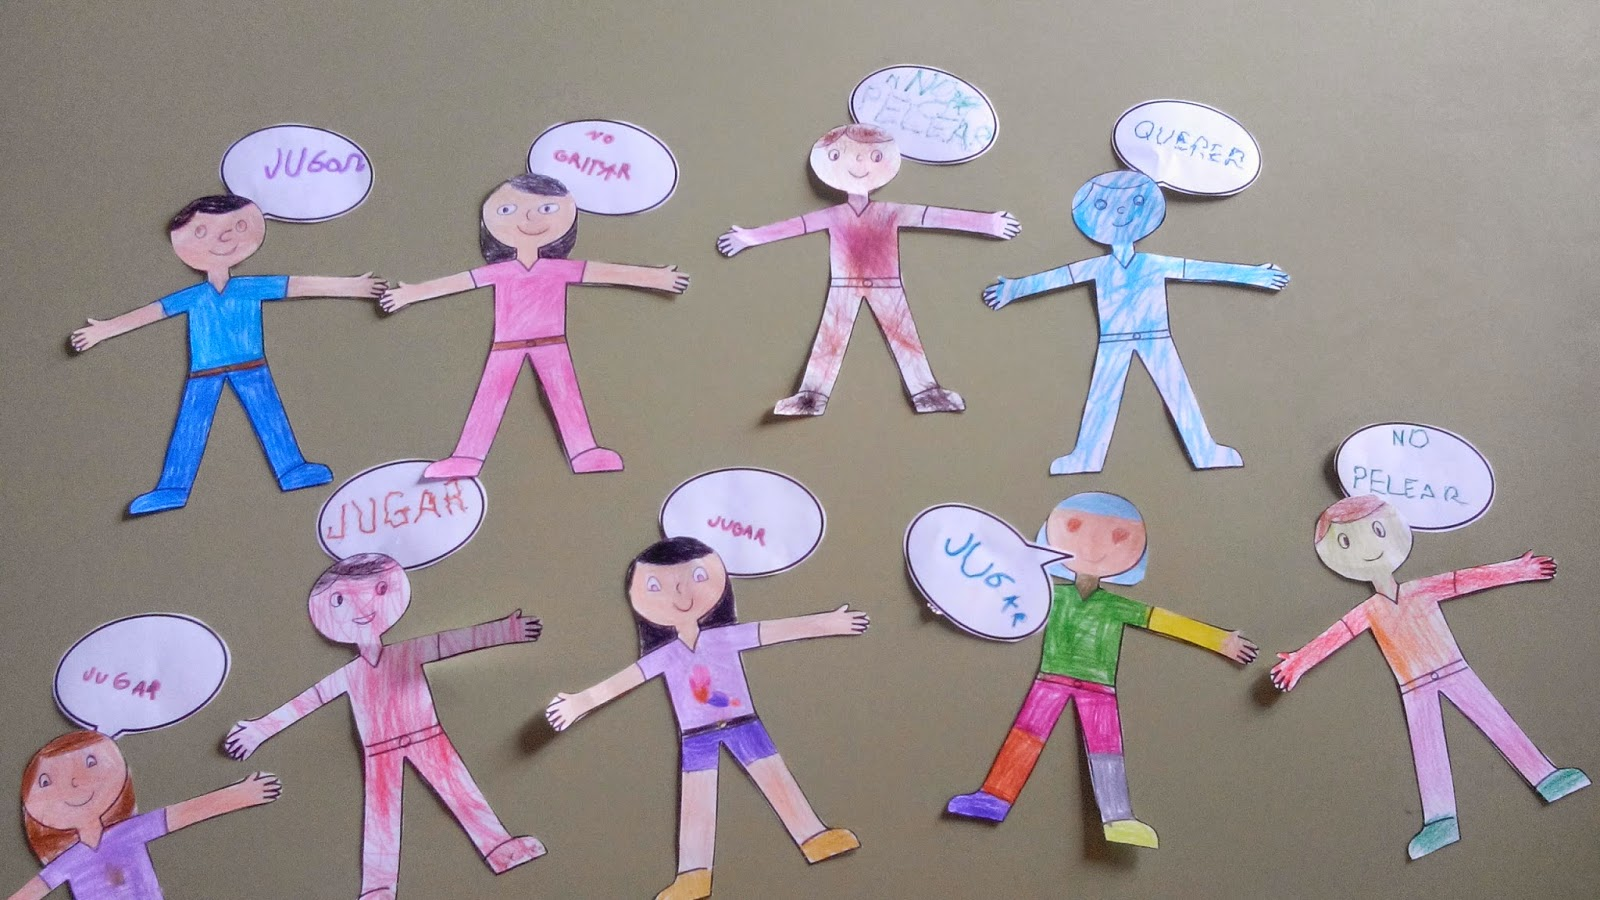 Rincón De Infantil Día De La Paz: El Rinconcito De Infantil: DÍA DE LA PAZ